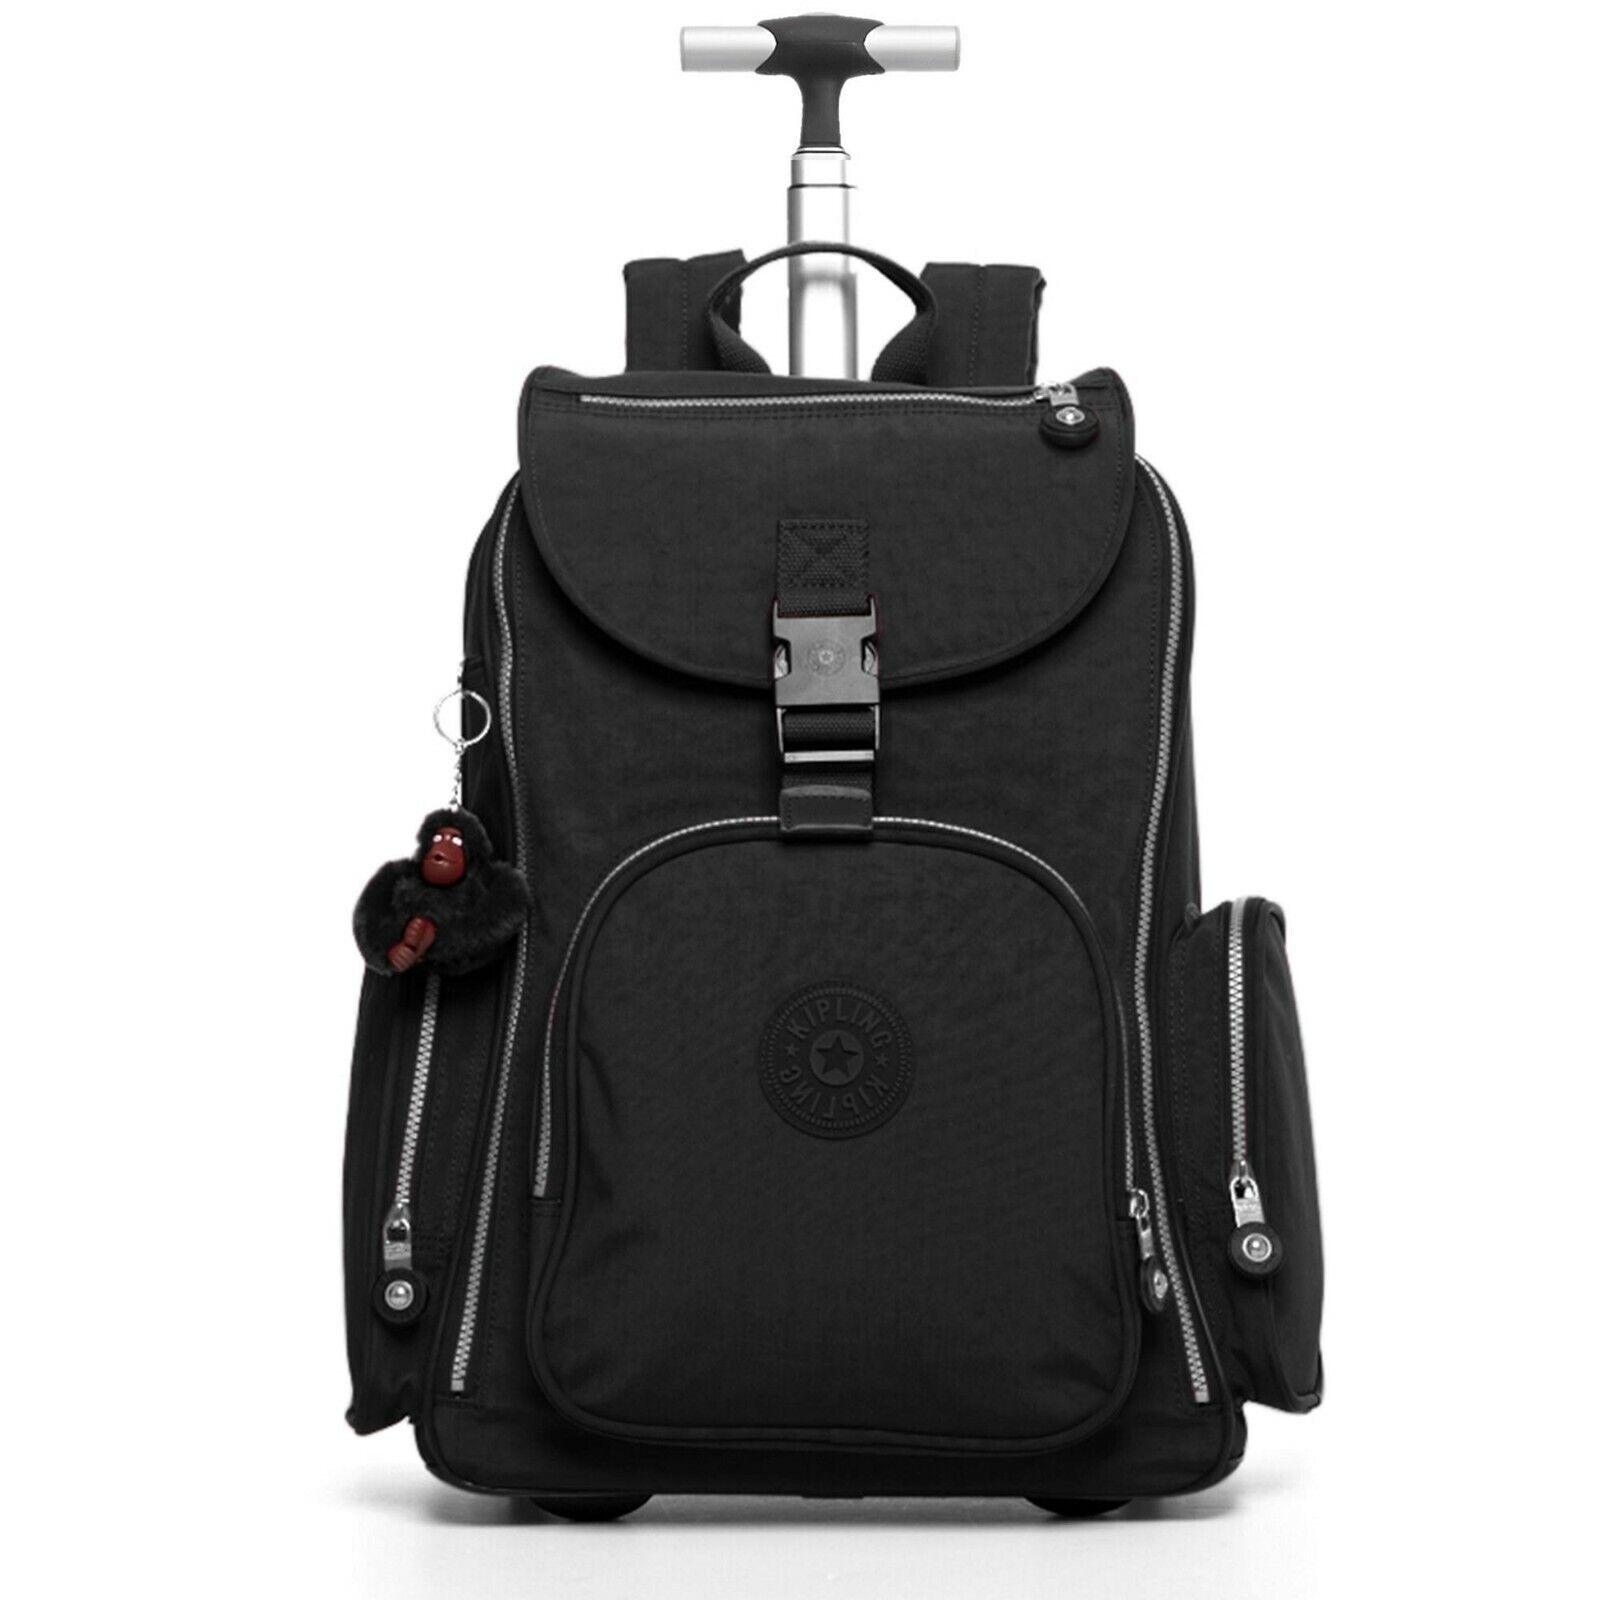 Kipling Luggage Alcatraz Wheeled Backpack with Laptop Protec